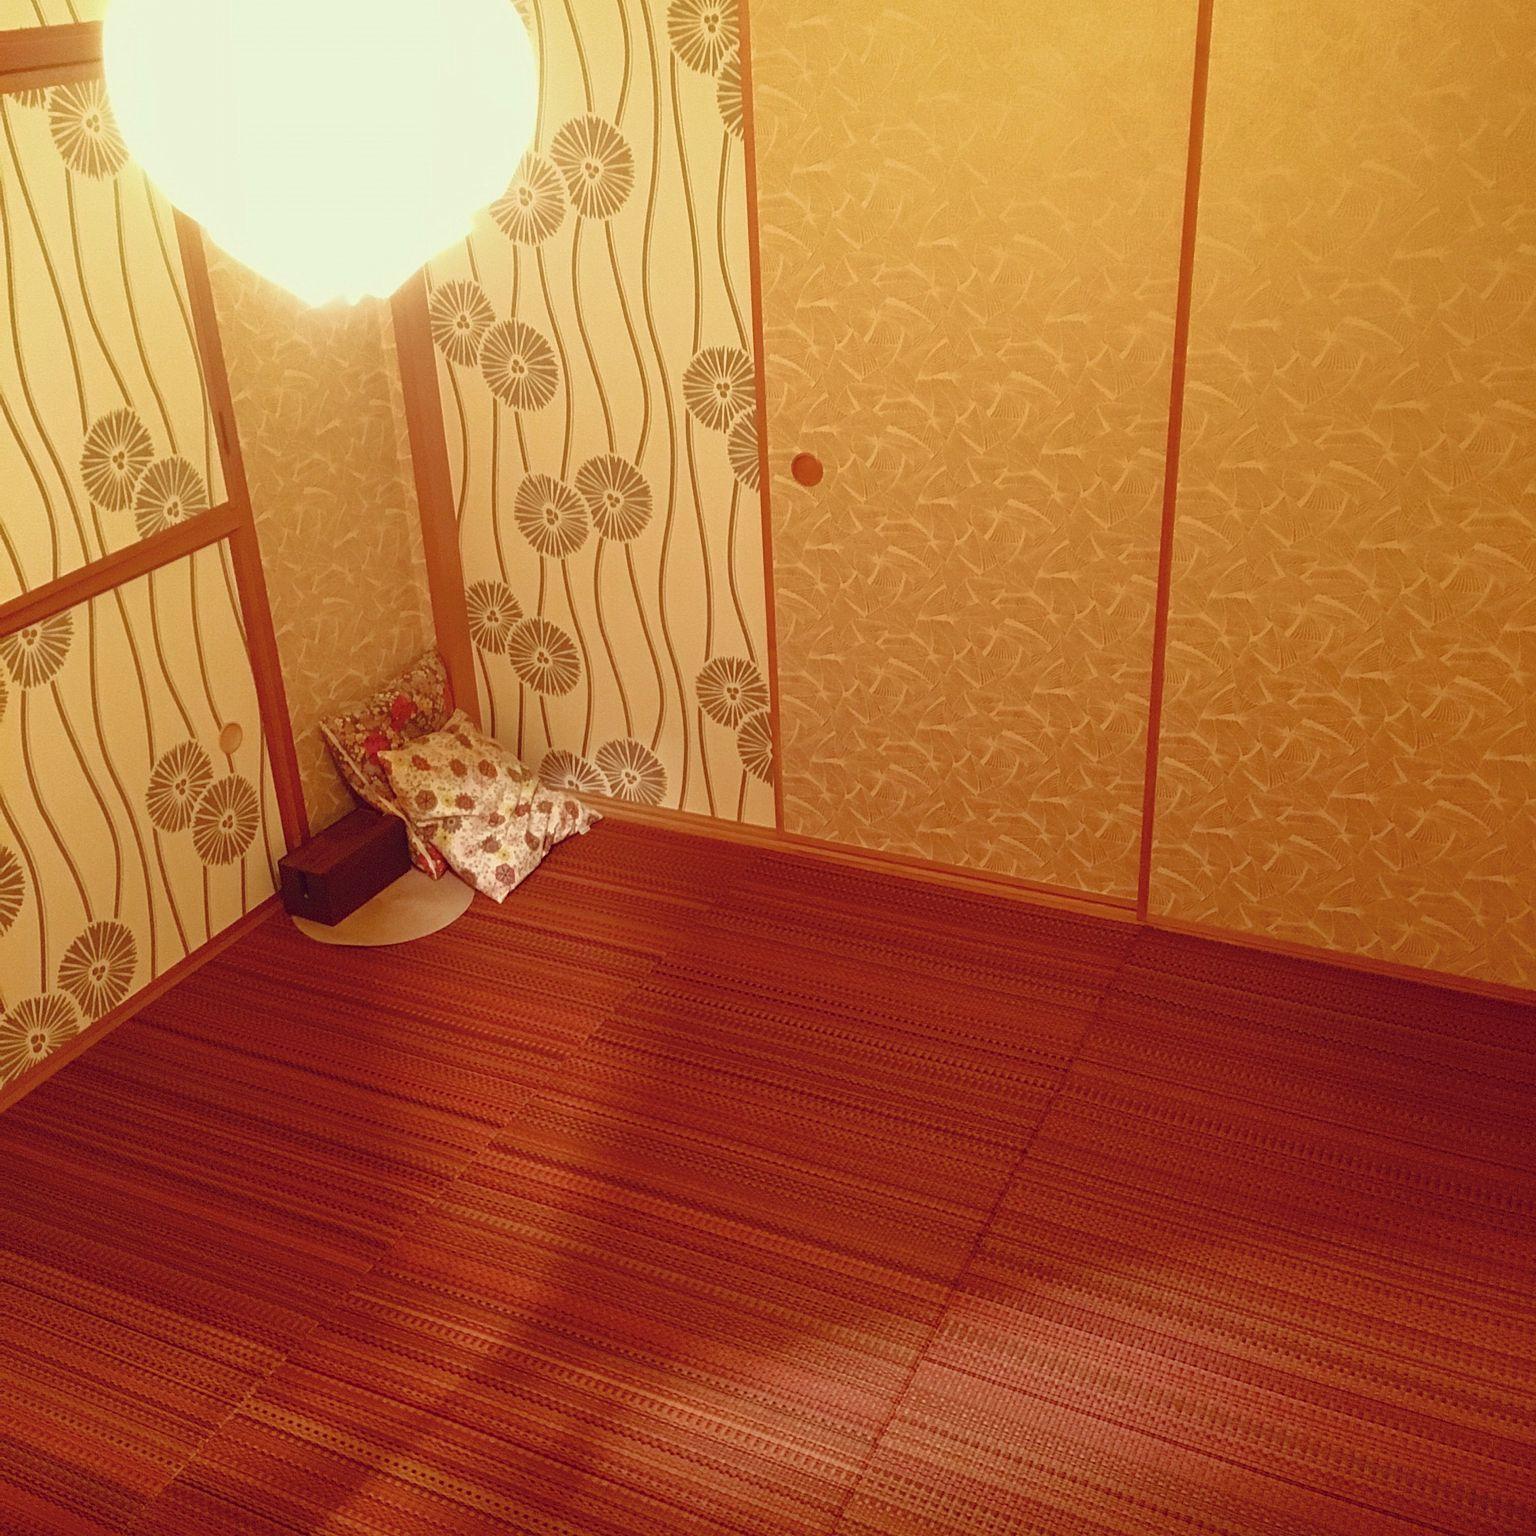 3ldk 家族住まいの襖に壁紙 照明 Le Klint 和室 Diy 寝室 などについてのインテリア実例を紹介 和室 壁紙 モダン 襖 和室 壁紙